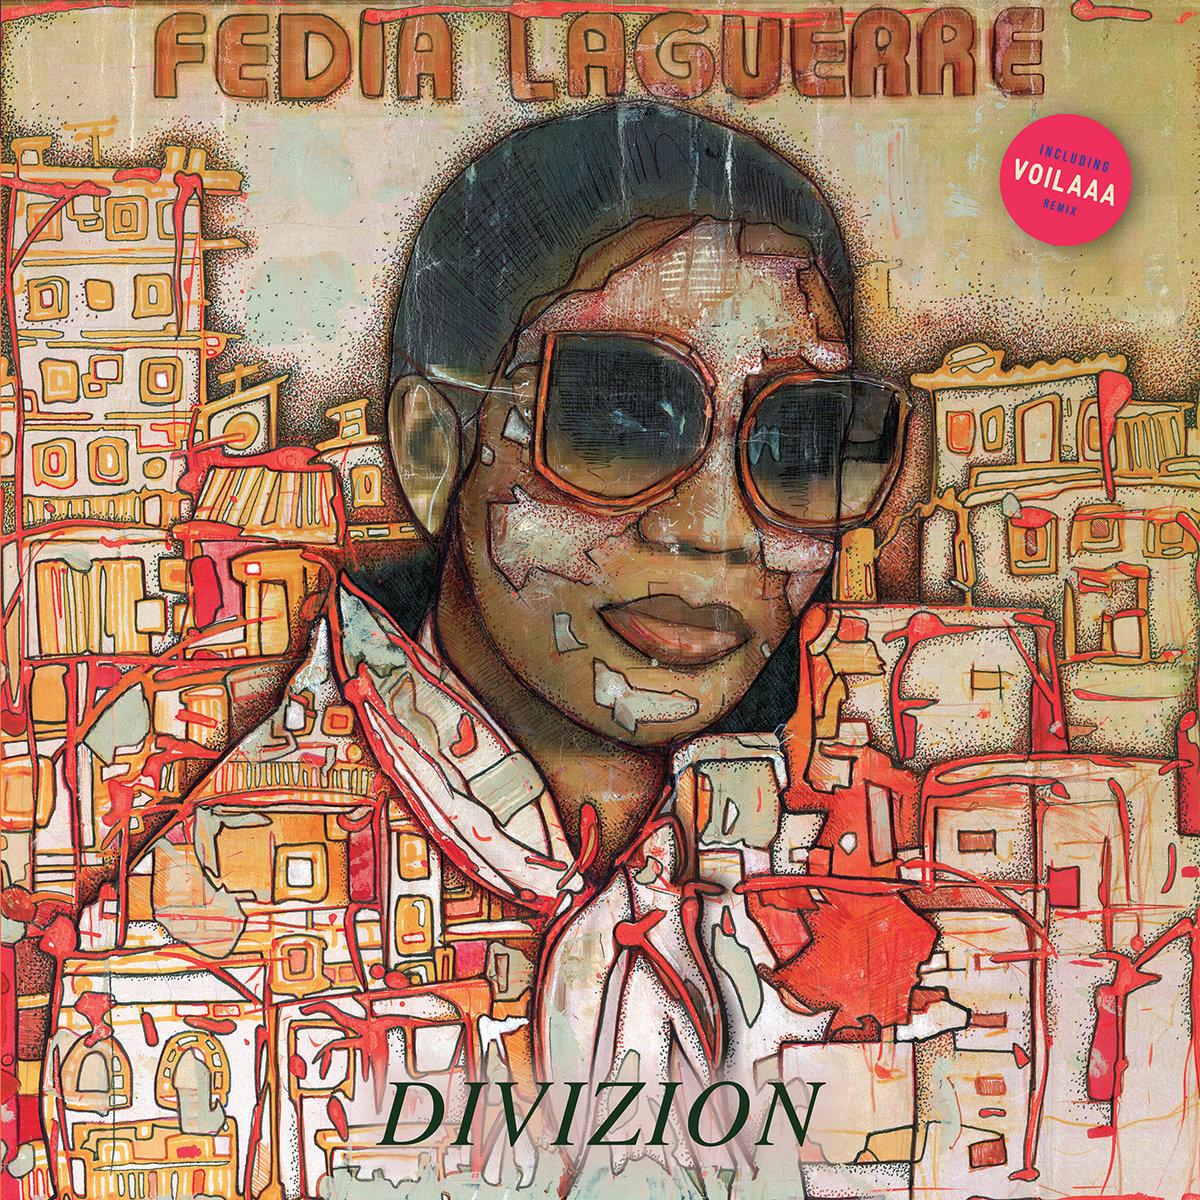 FEDIA LAGUERRE / フェディア・ラゲール / DIVIZION